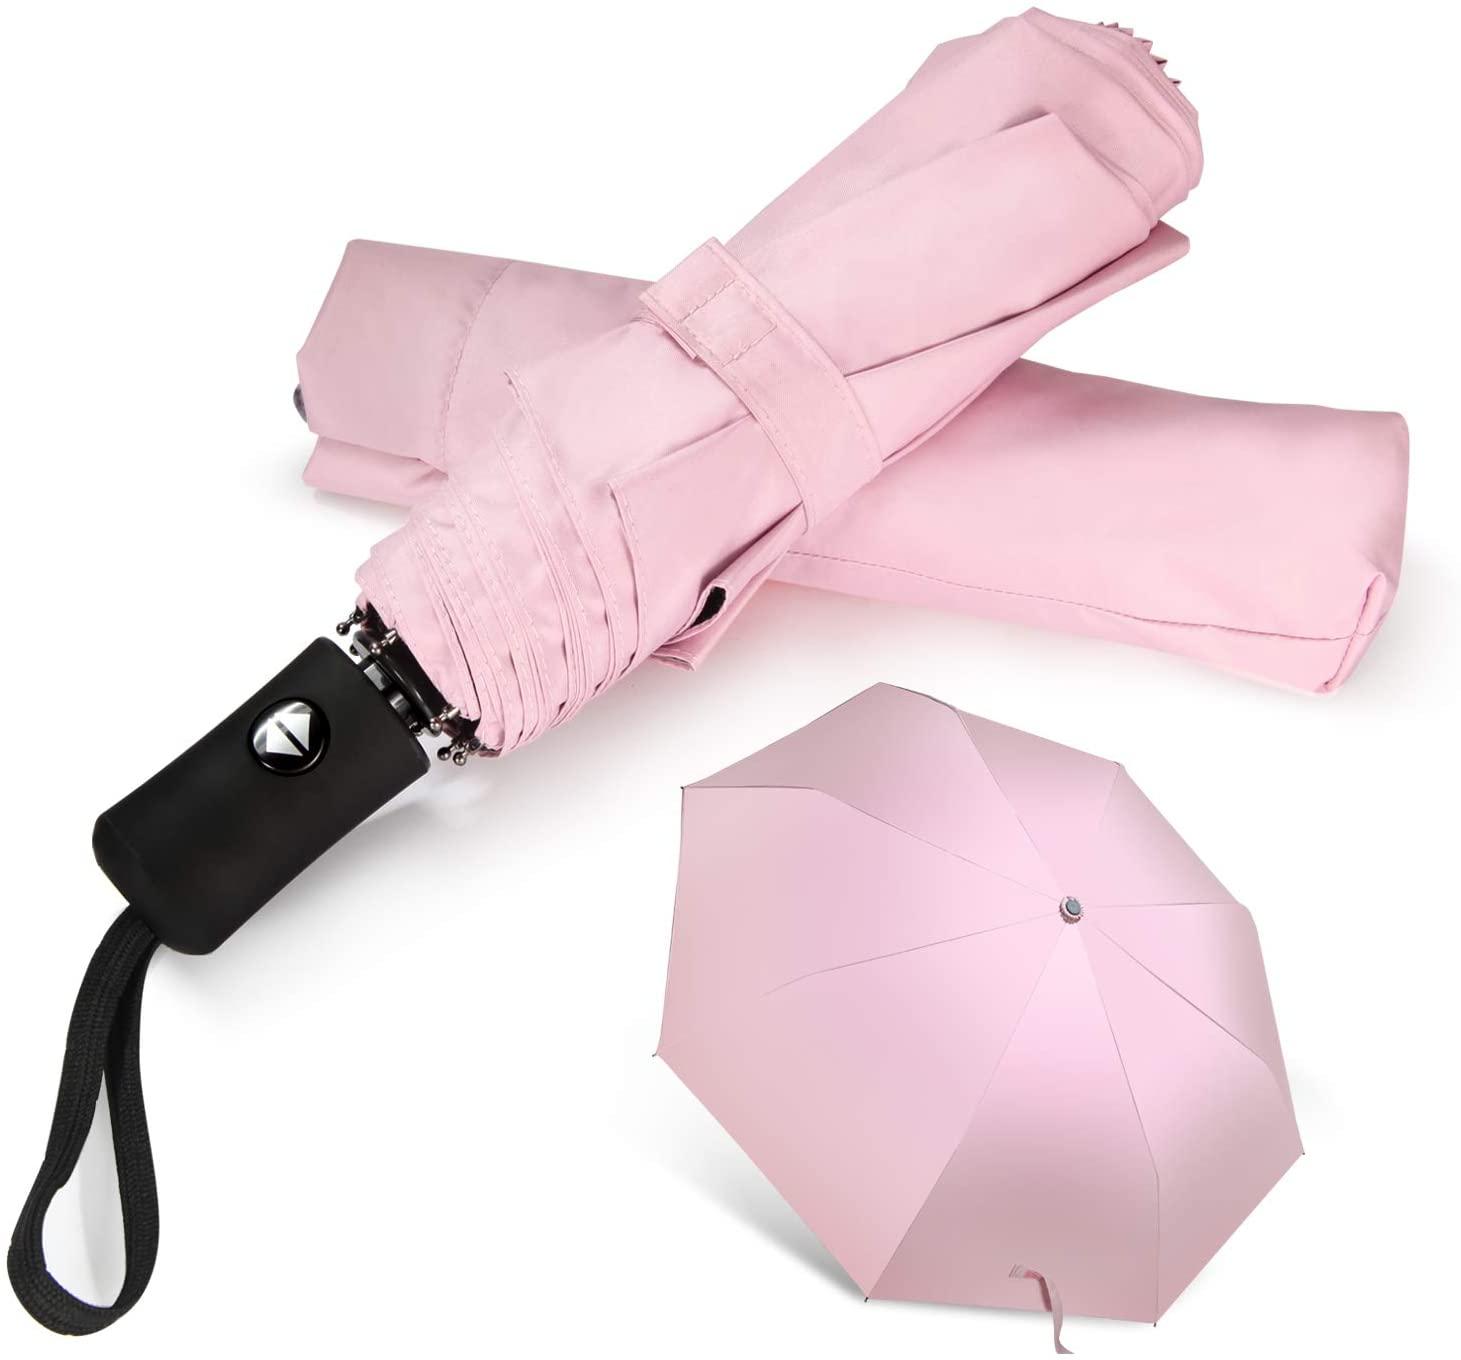 Travel Umbrella Compact Folding Sun Umbrellas Lighweight Auto Open Close for Women Parasol Pink